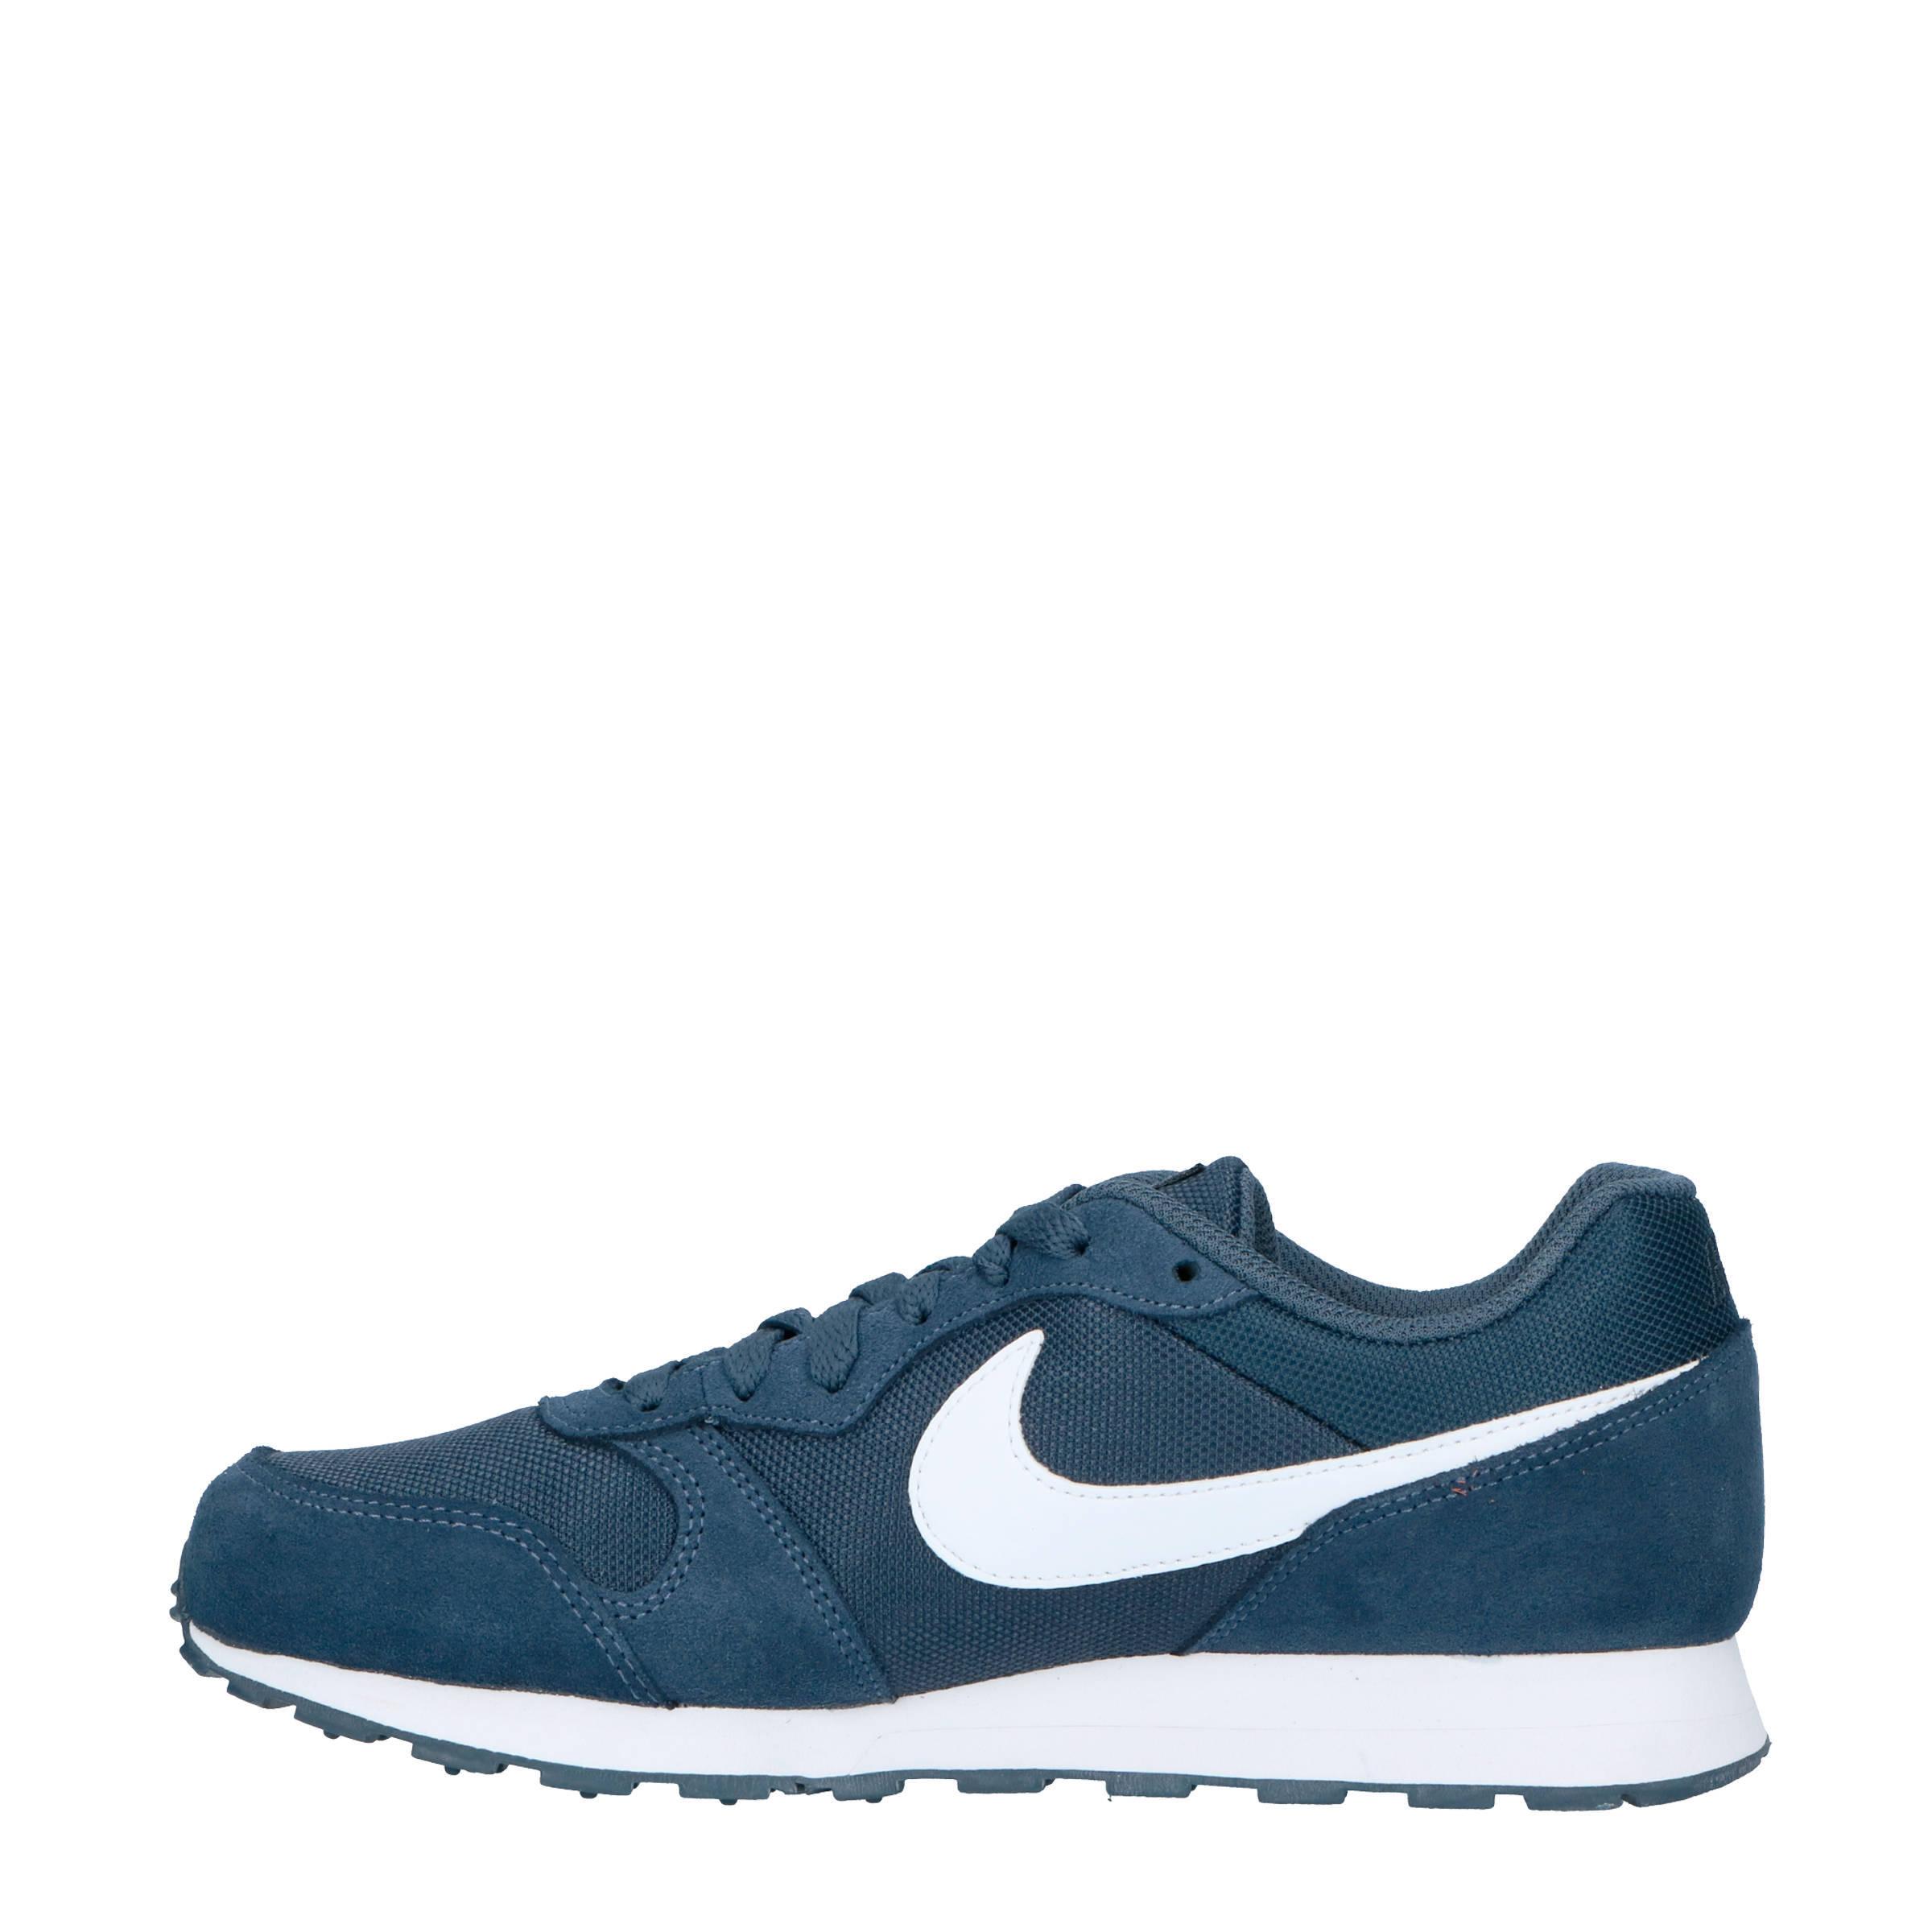 sports shoes 49d3f 01fb6 Nike MD Runner 2 PE sneakers   wehkamp